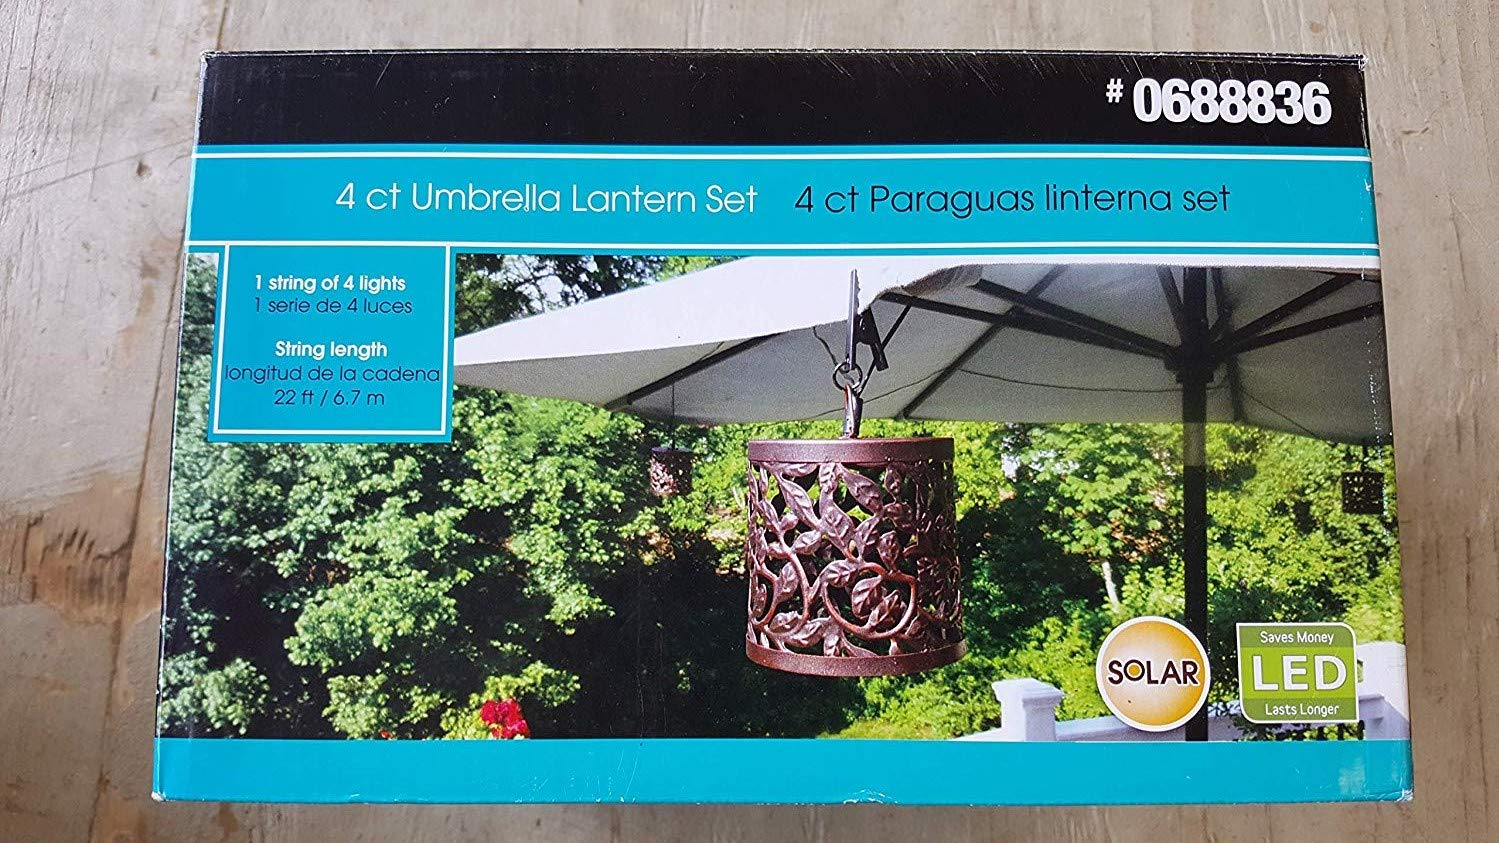 Solar LED 4 Count Umbrella Lantern Set